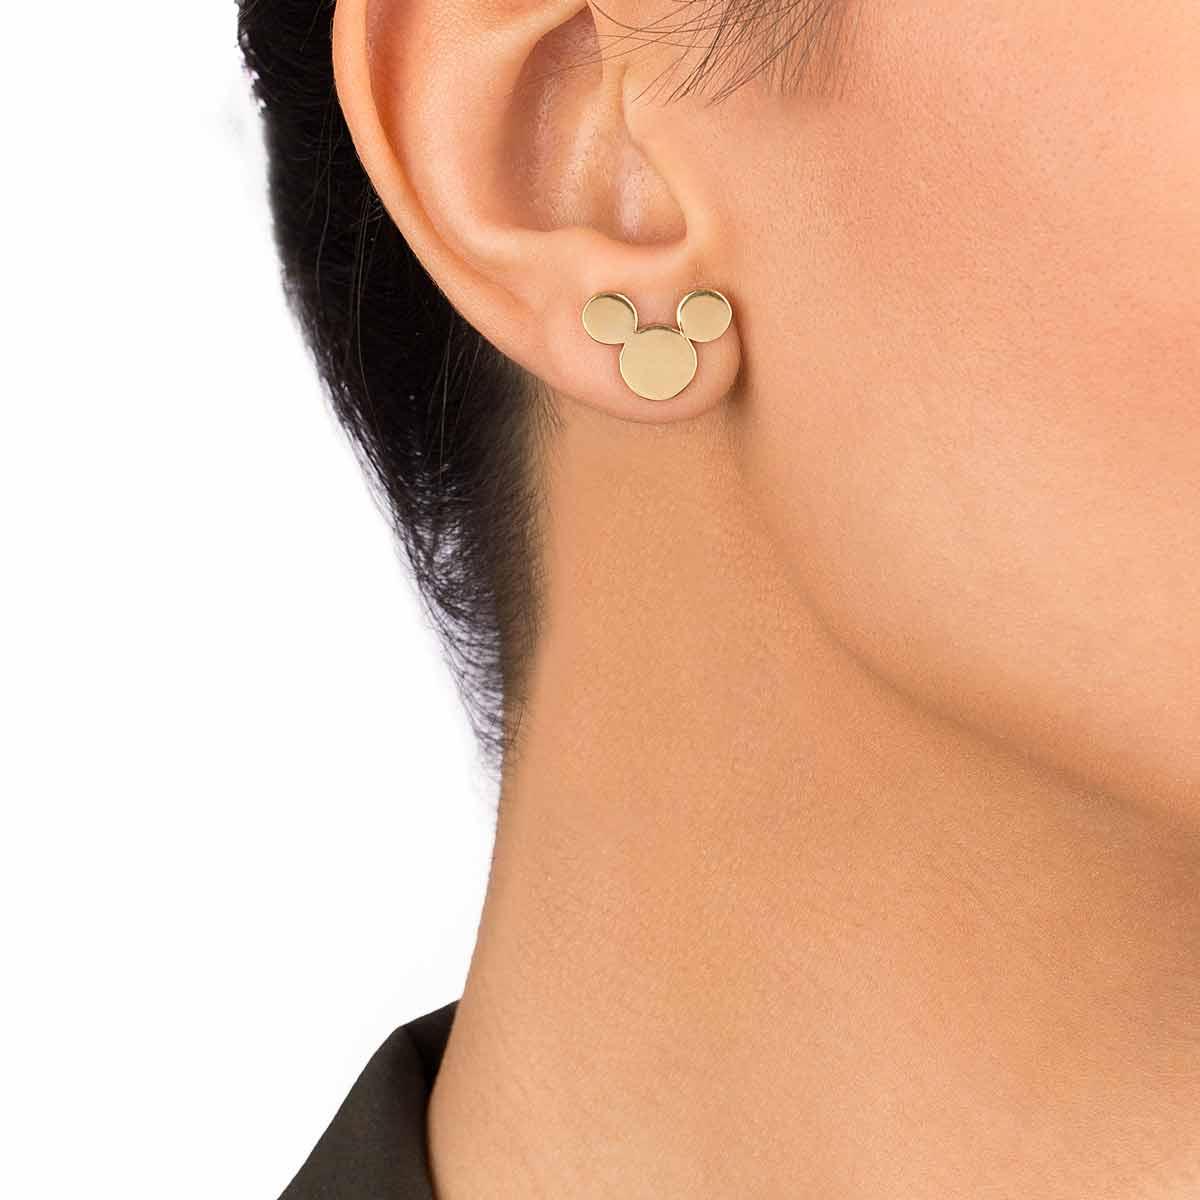 گوشواره طلا میکی ماوس